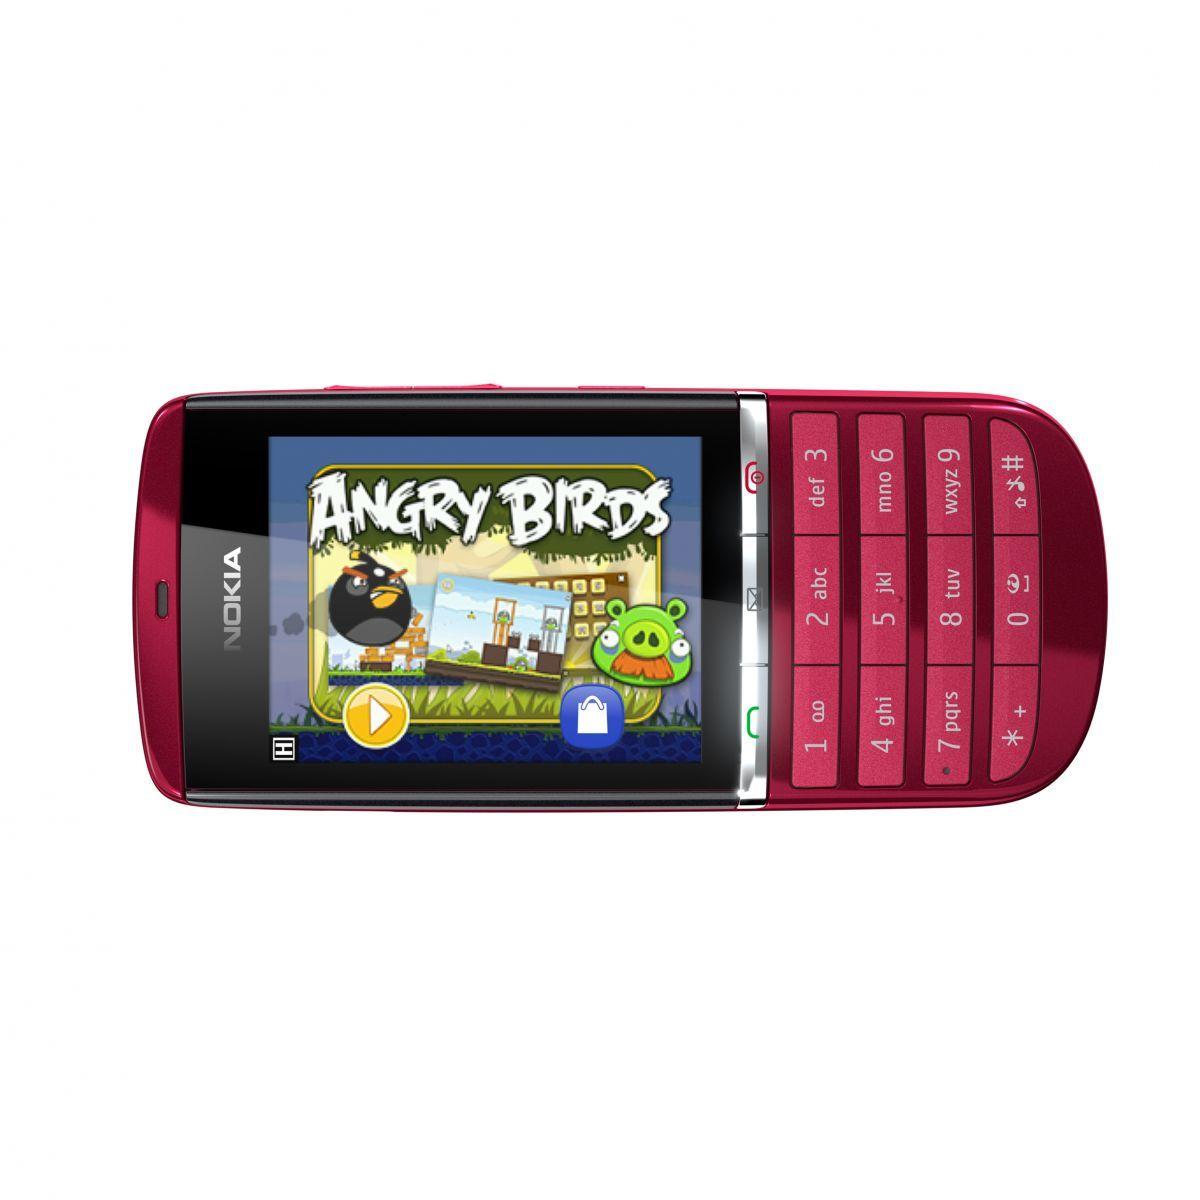 Foto de Nokia Asha 300 (4/5)